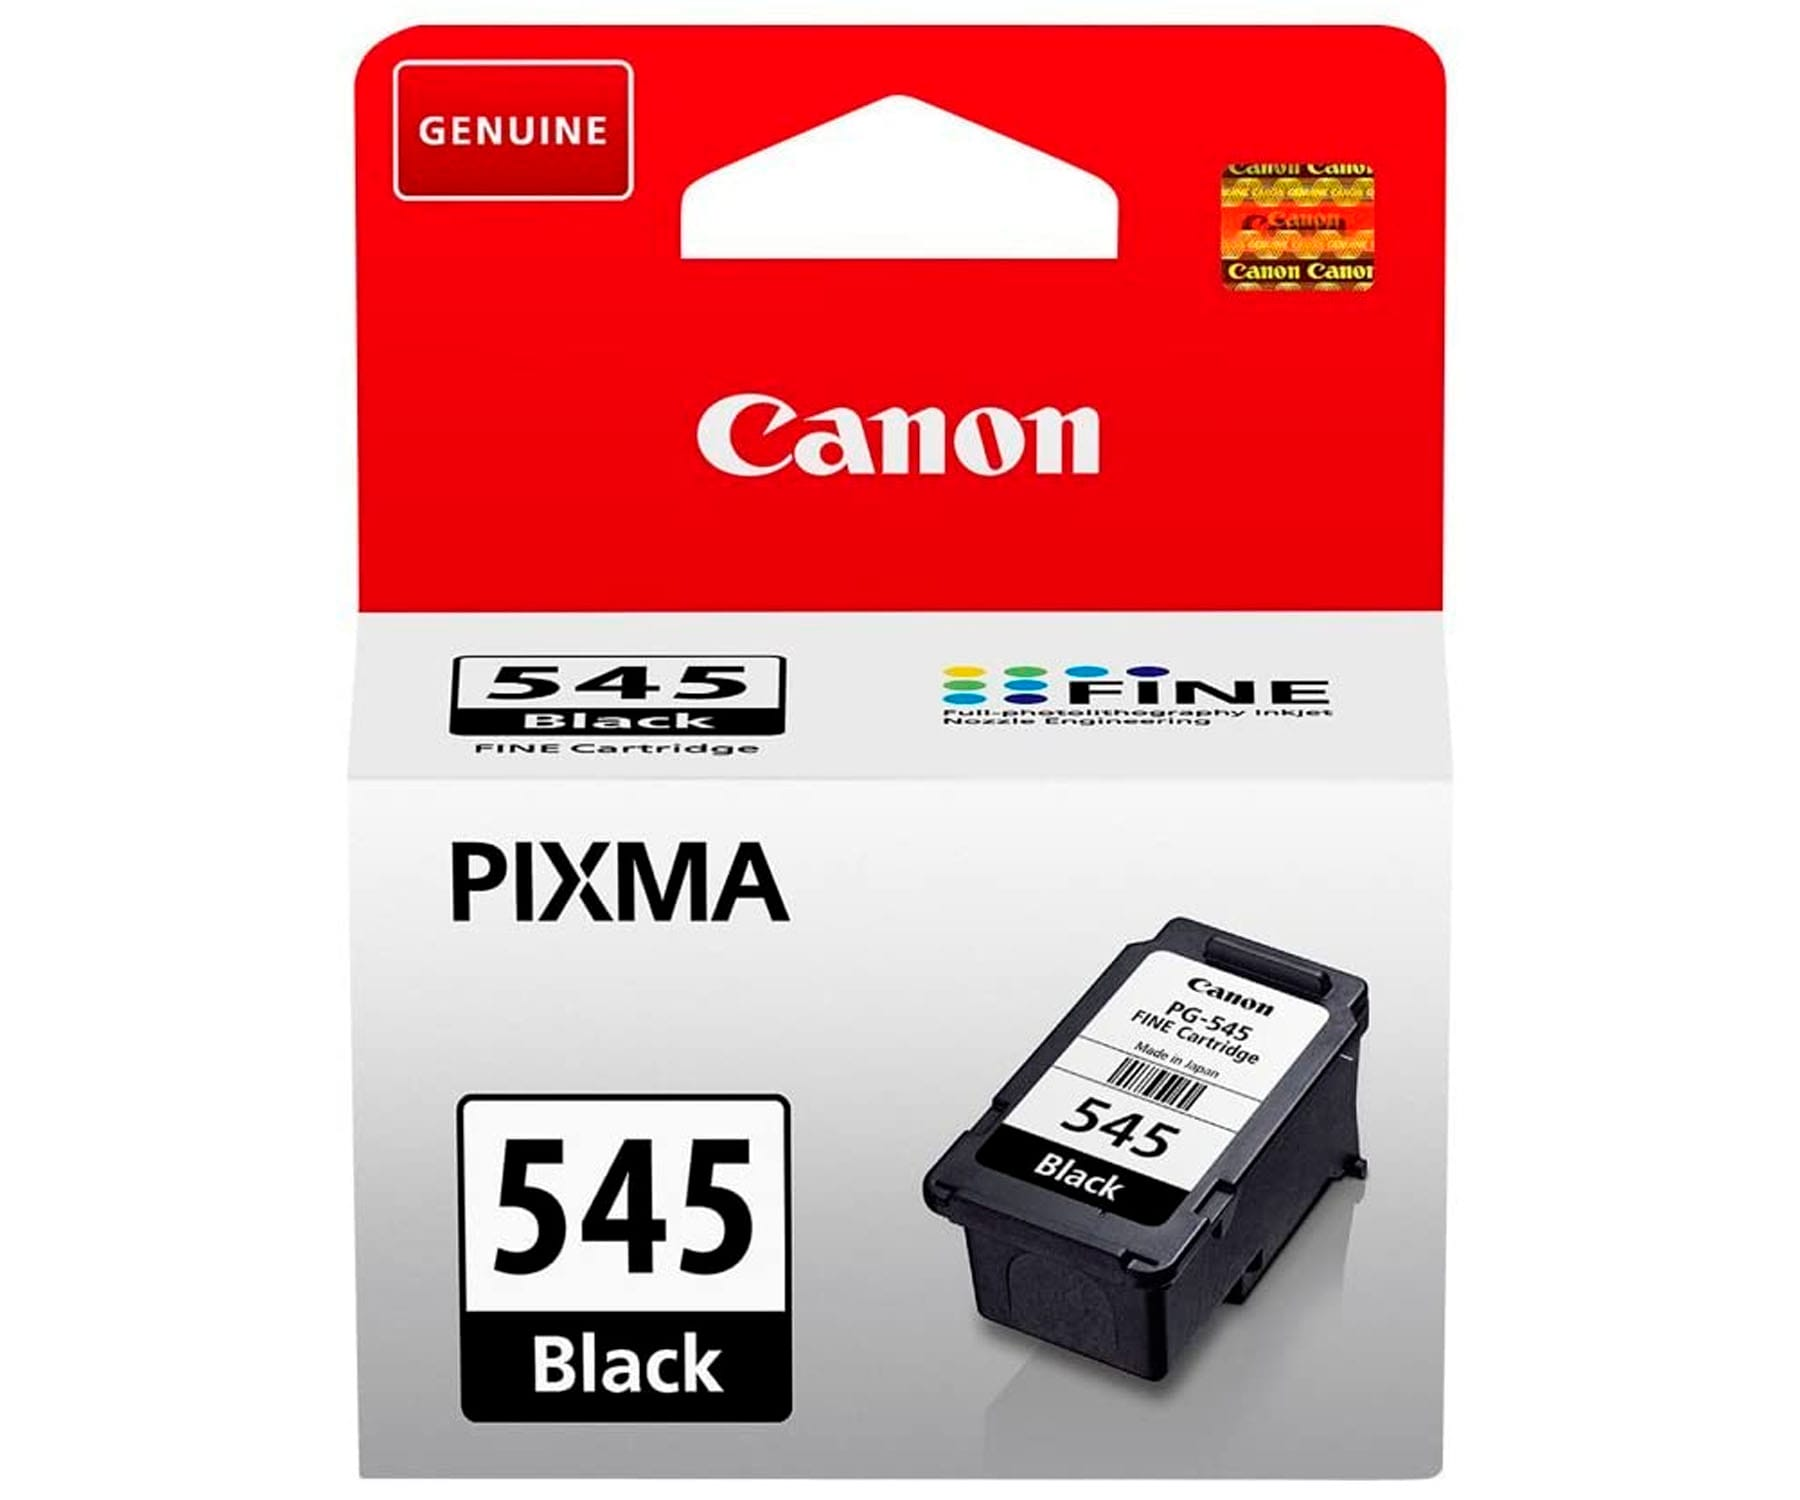 CANON PG-545 COLOR NEGRO CARTUCHO DE TINTA 8ML FINE PIXMA